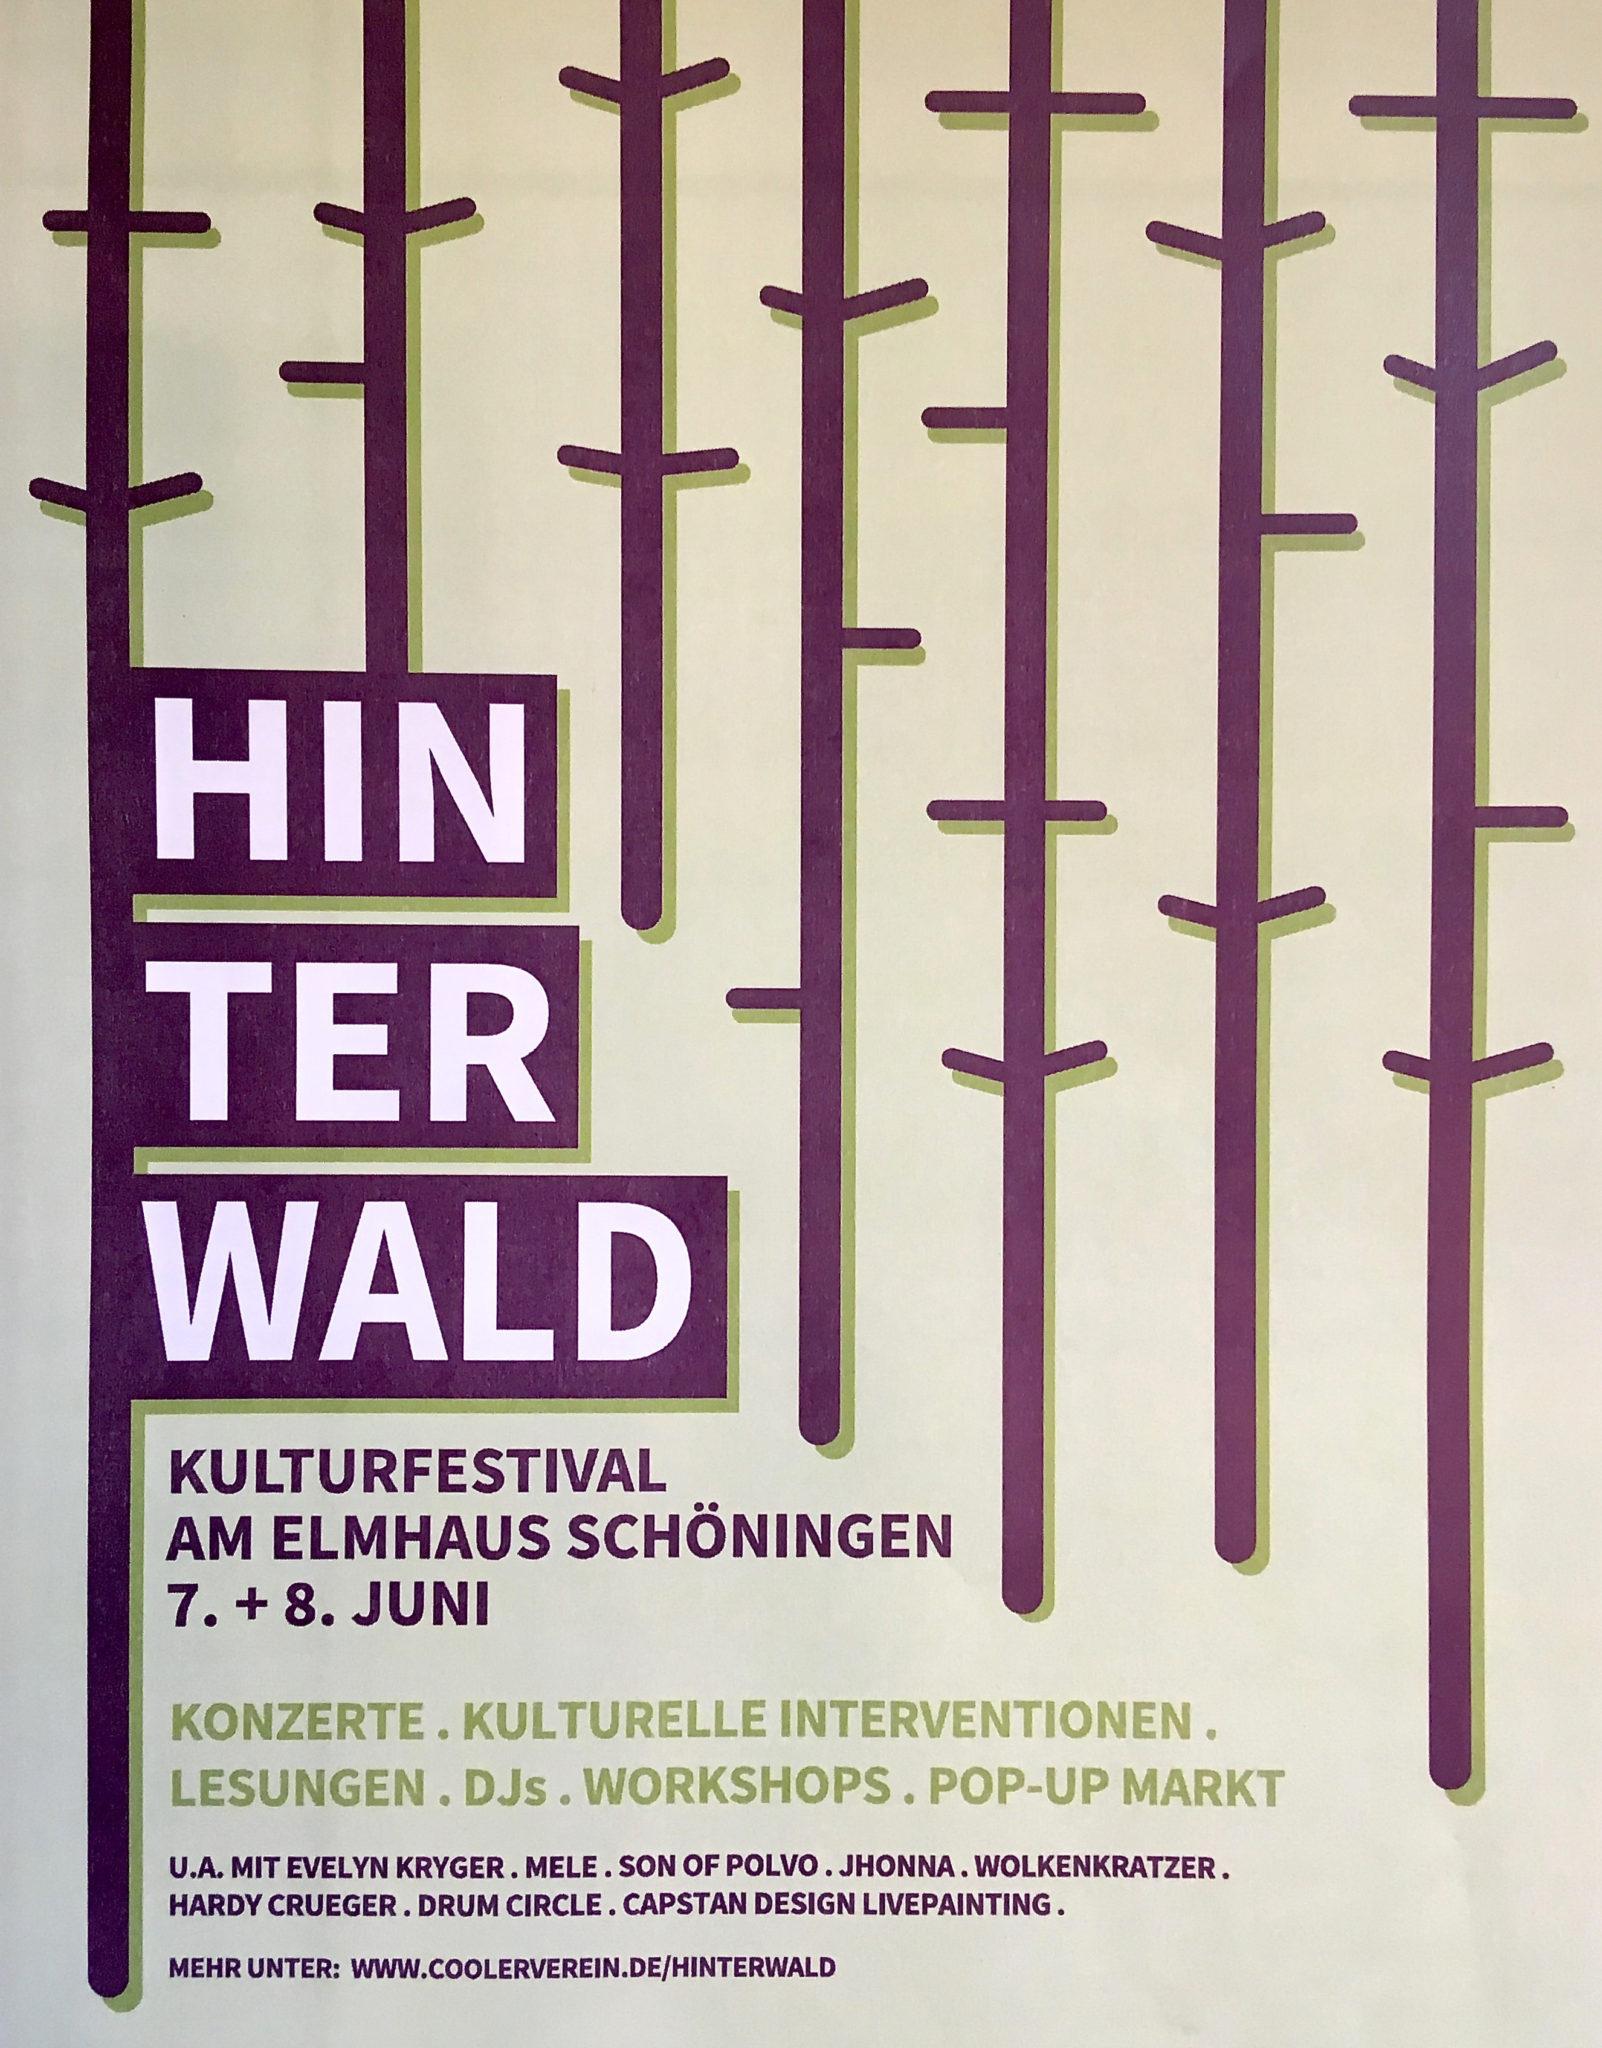 Hinterwald Kulturfestival